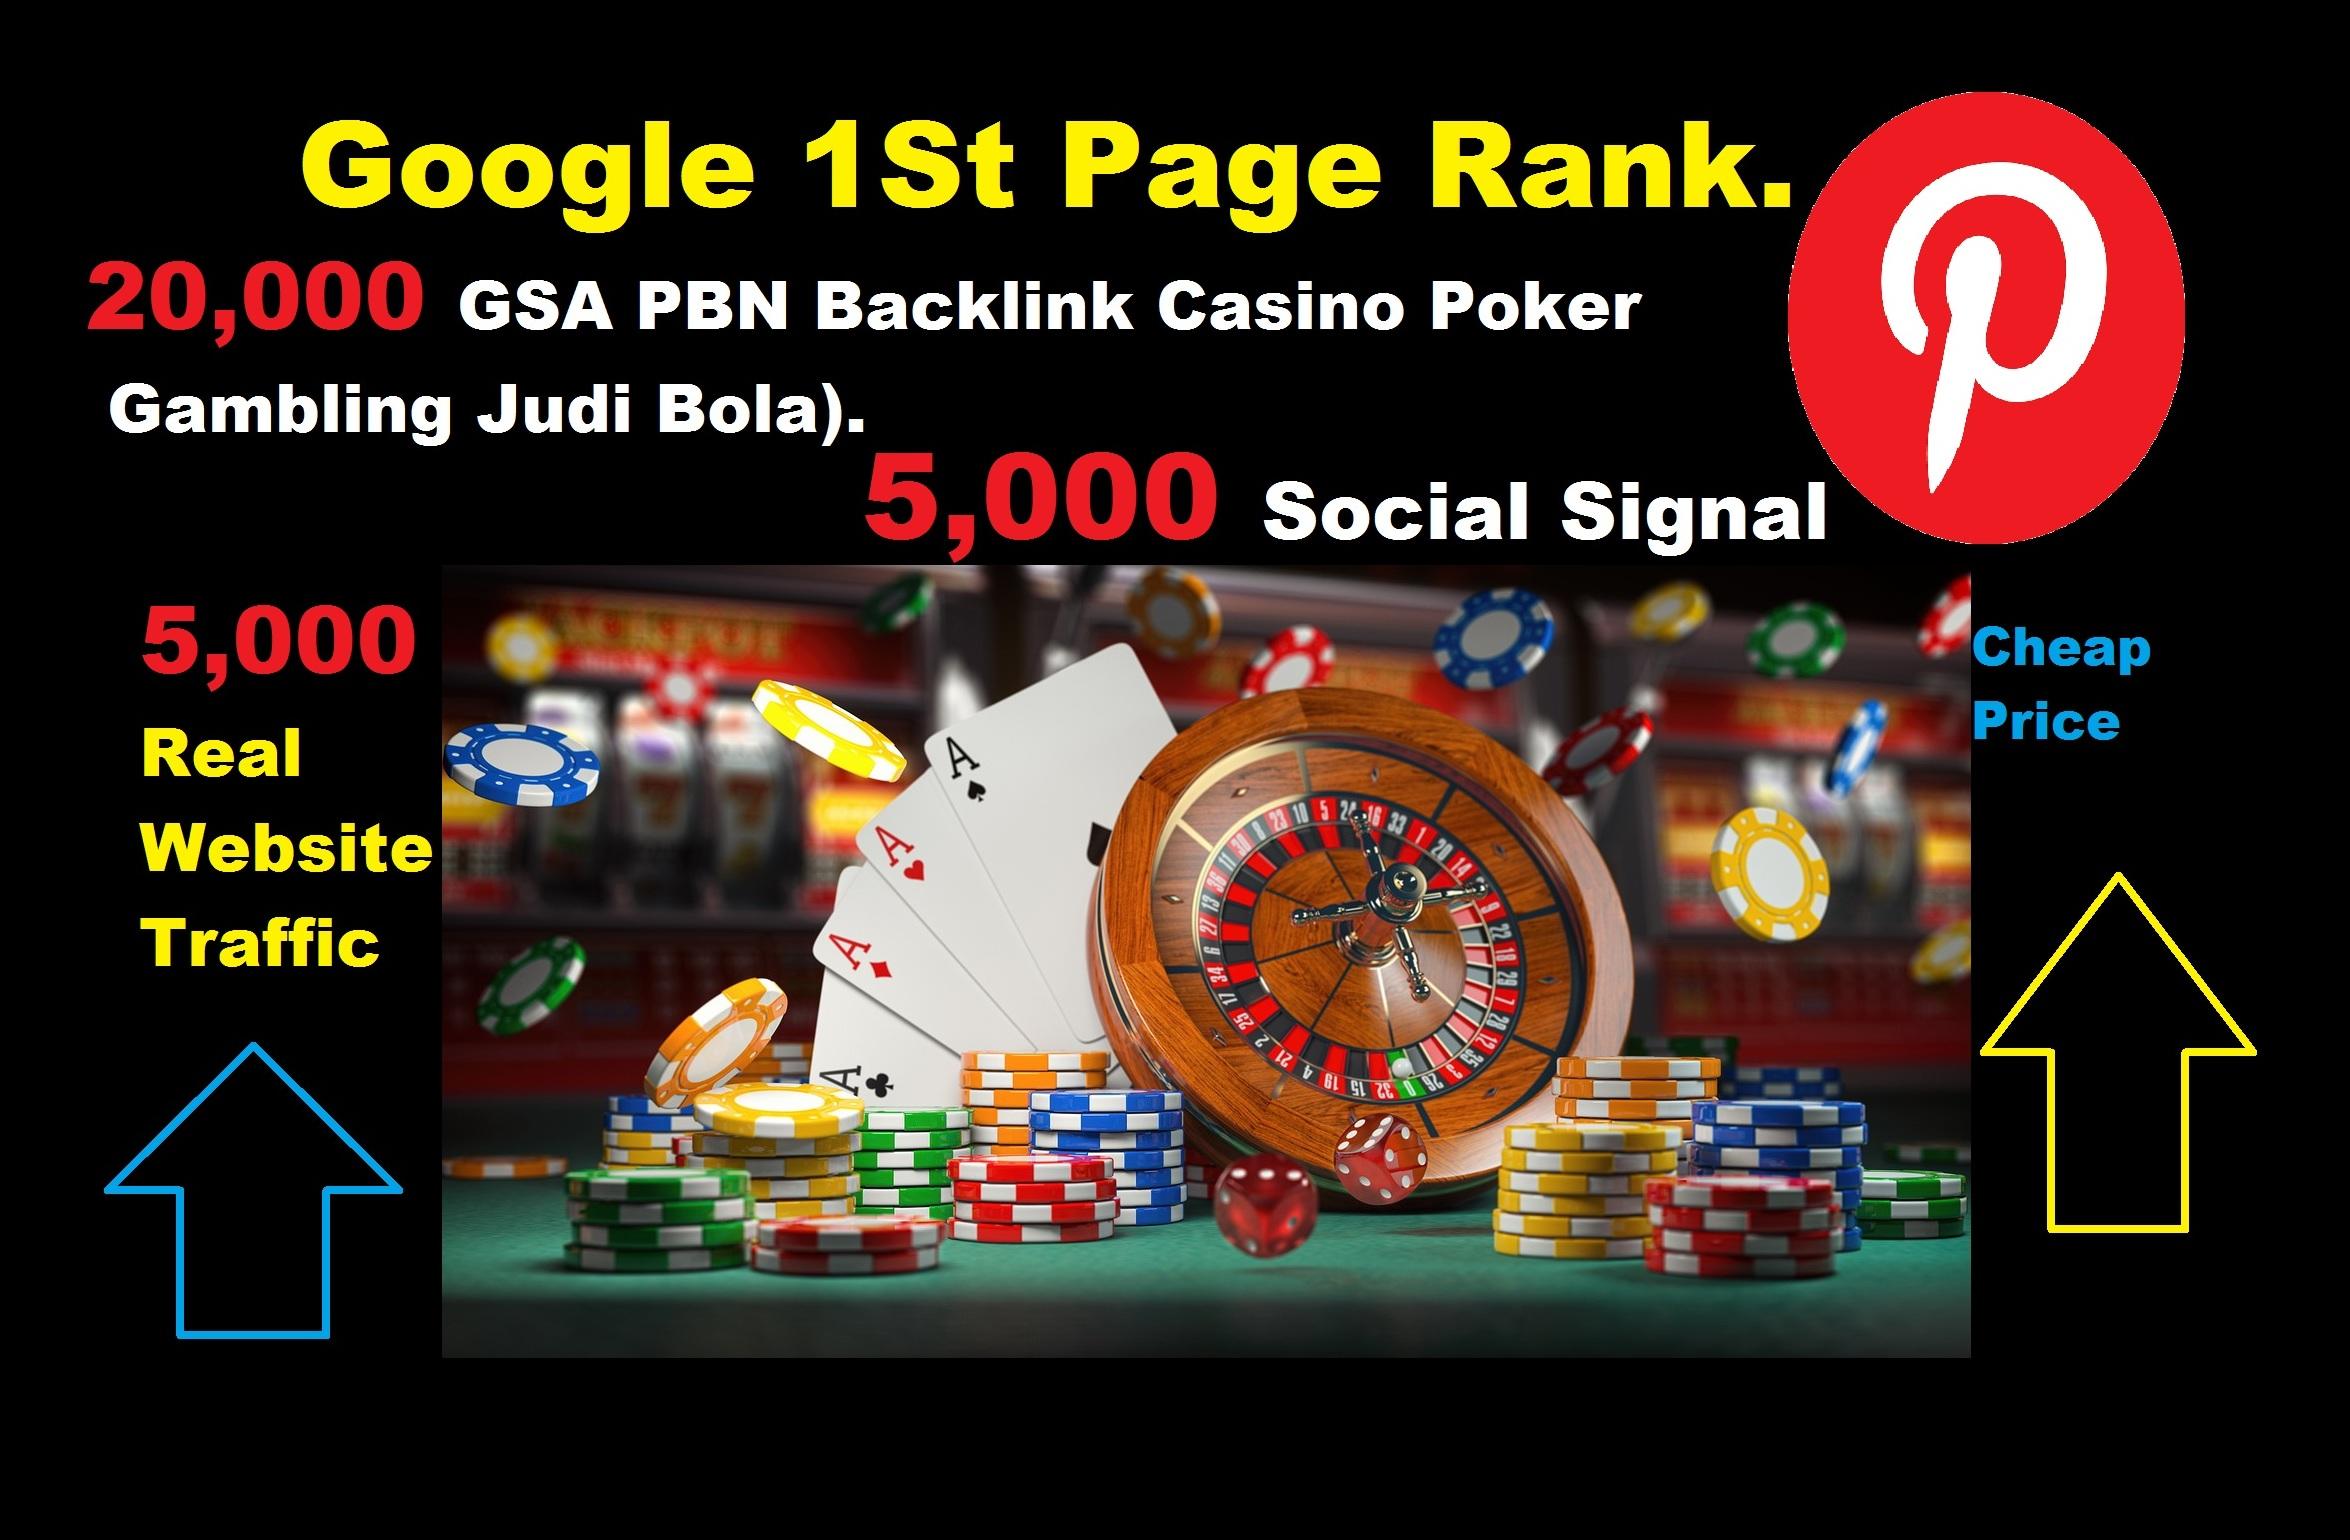 Google Rank Pinterest Social Signal Instagram Traffic Backlink Casino Poker Gambling Online Bet